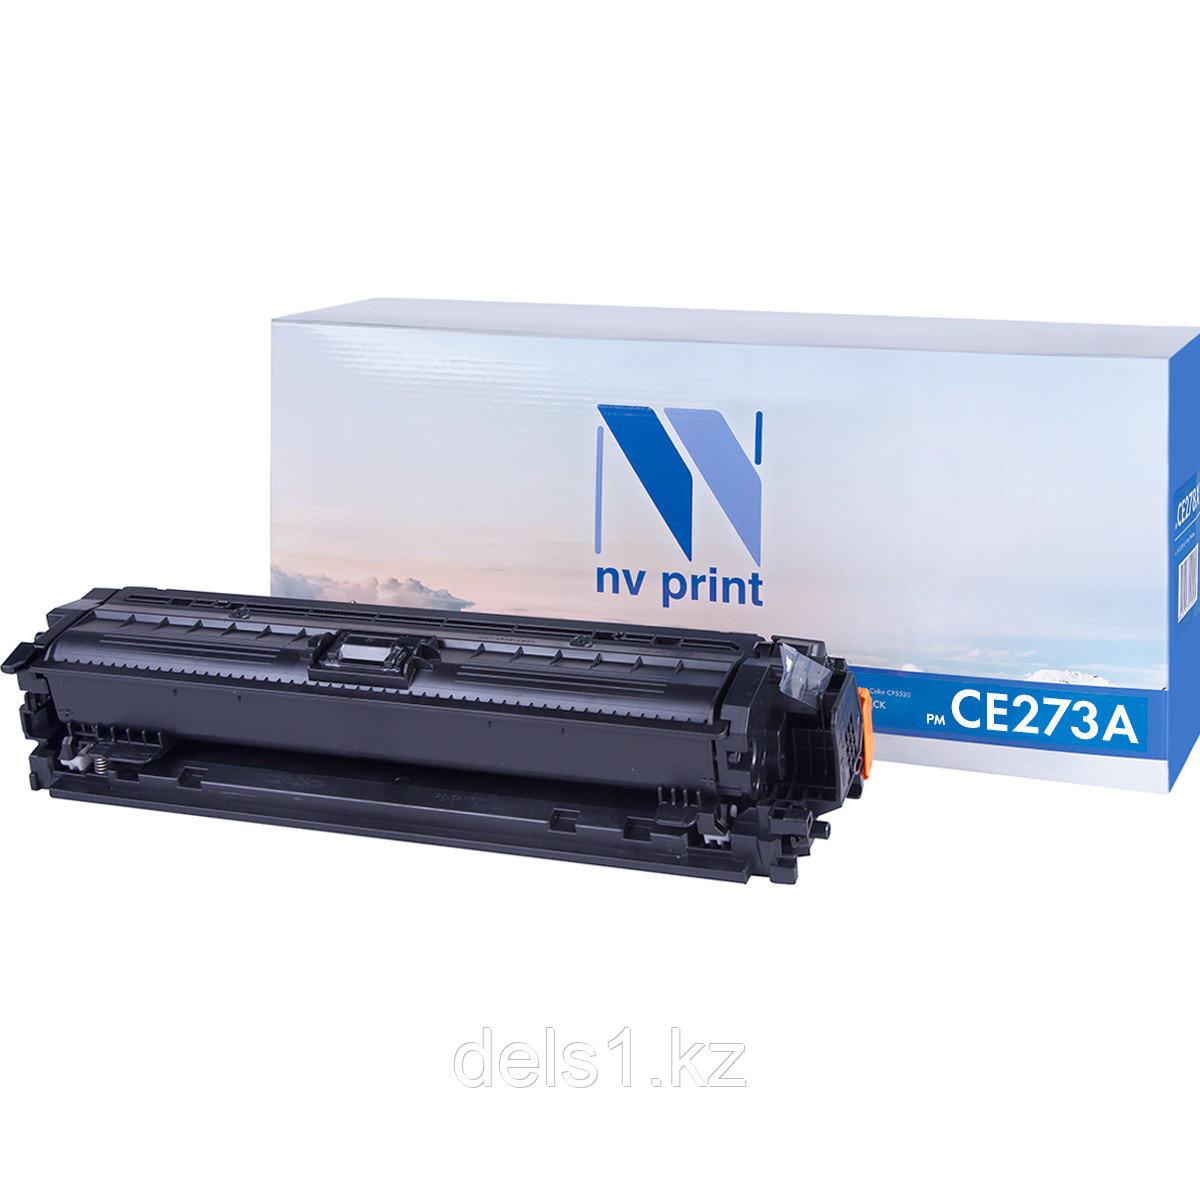 Картридж NVP NV-CE273A Magenta совместимый c HP  Color CP5525dn   CP5525n   CP5525xh   M750dn   M750n   M750xh